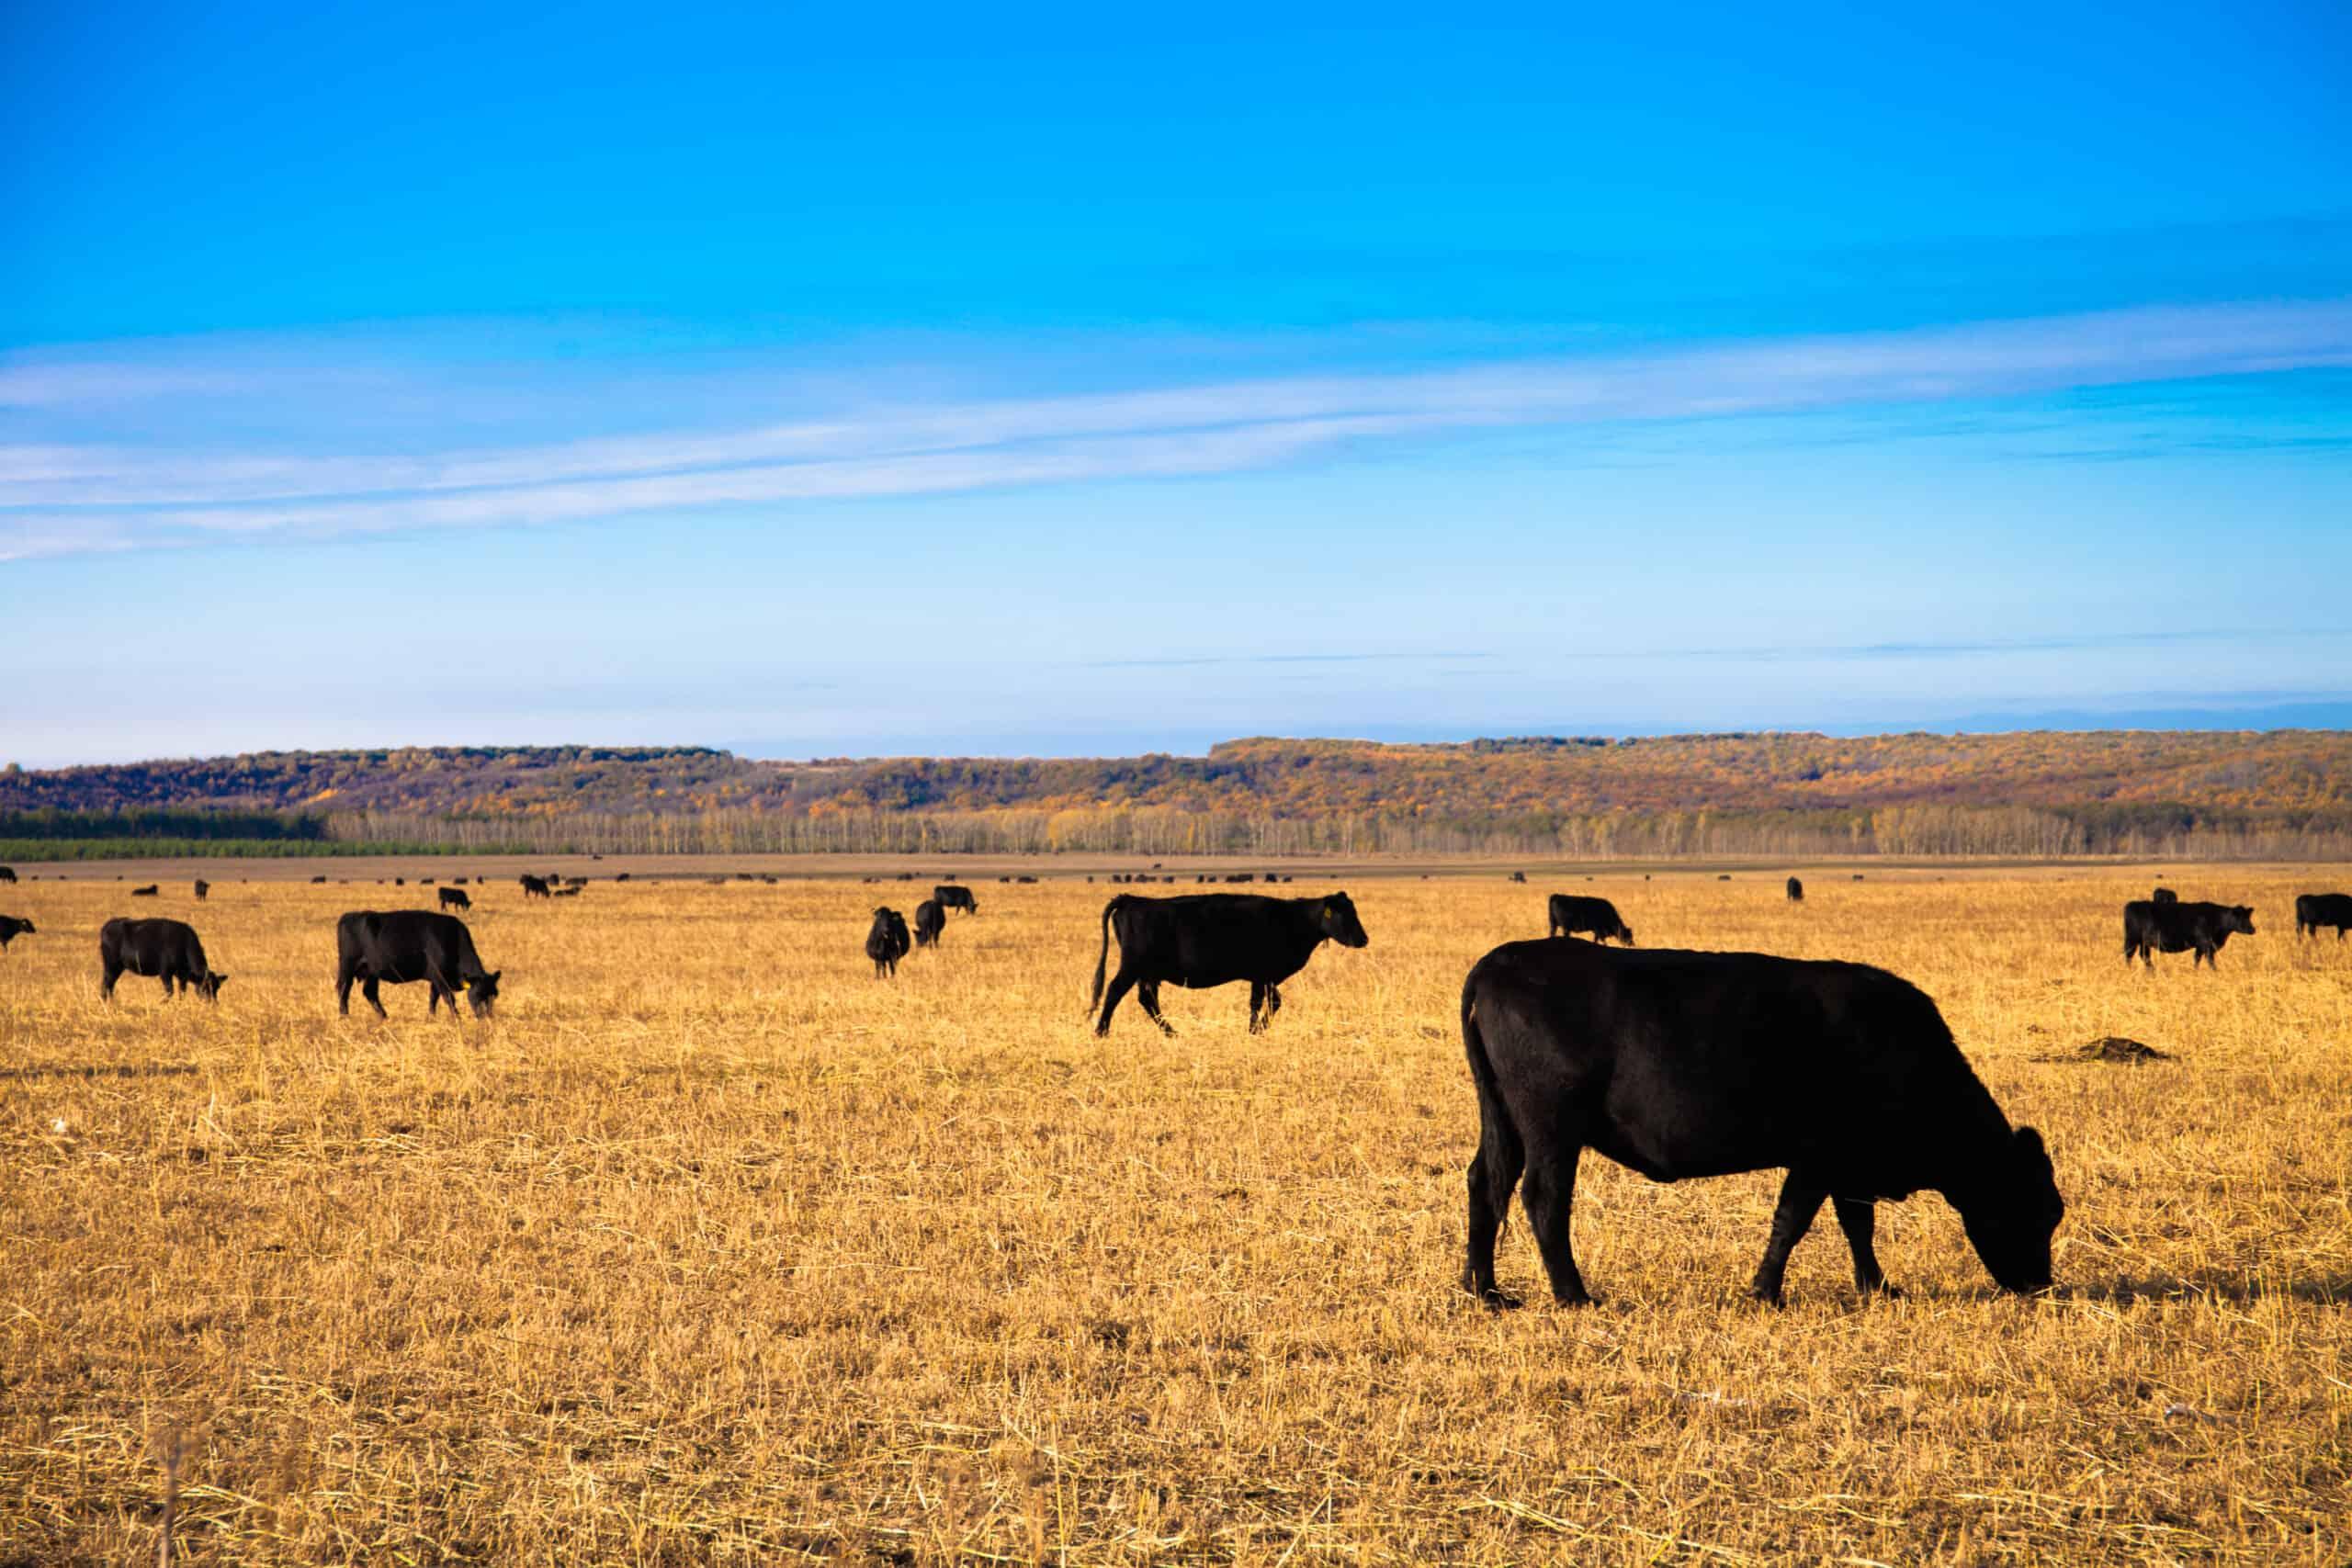 Black Angus Bulls graze on the meadow